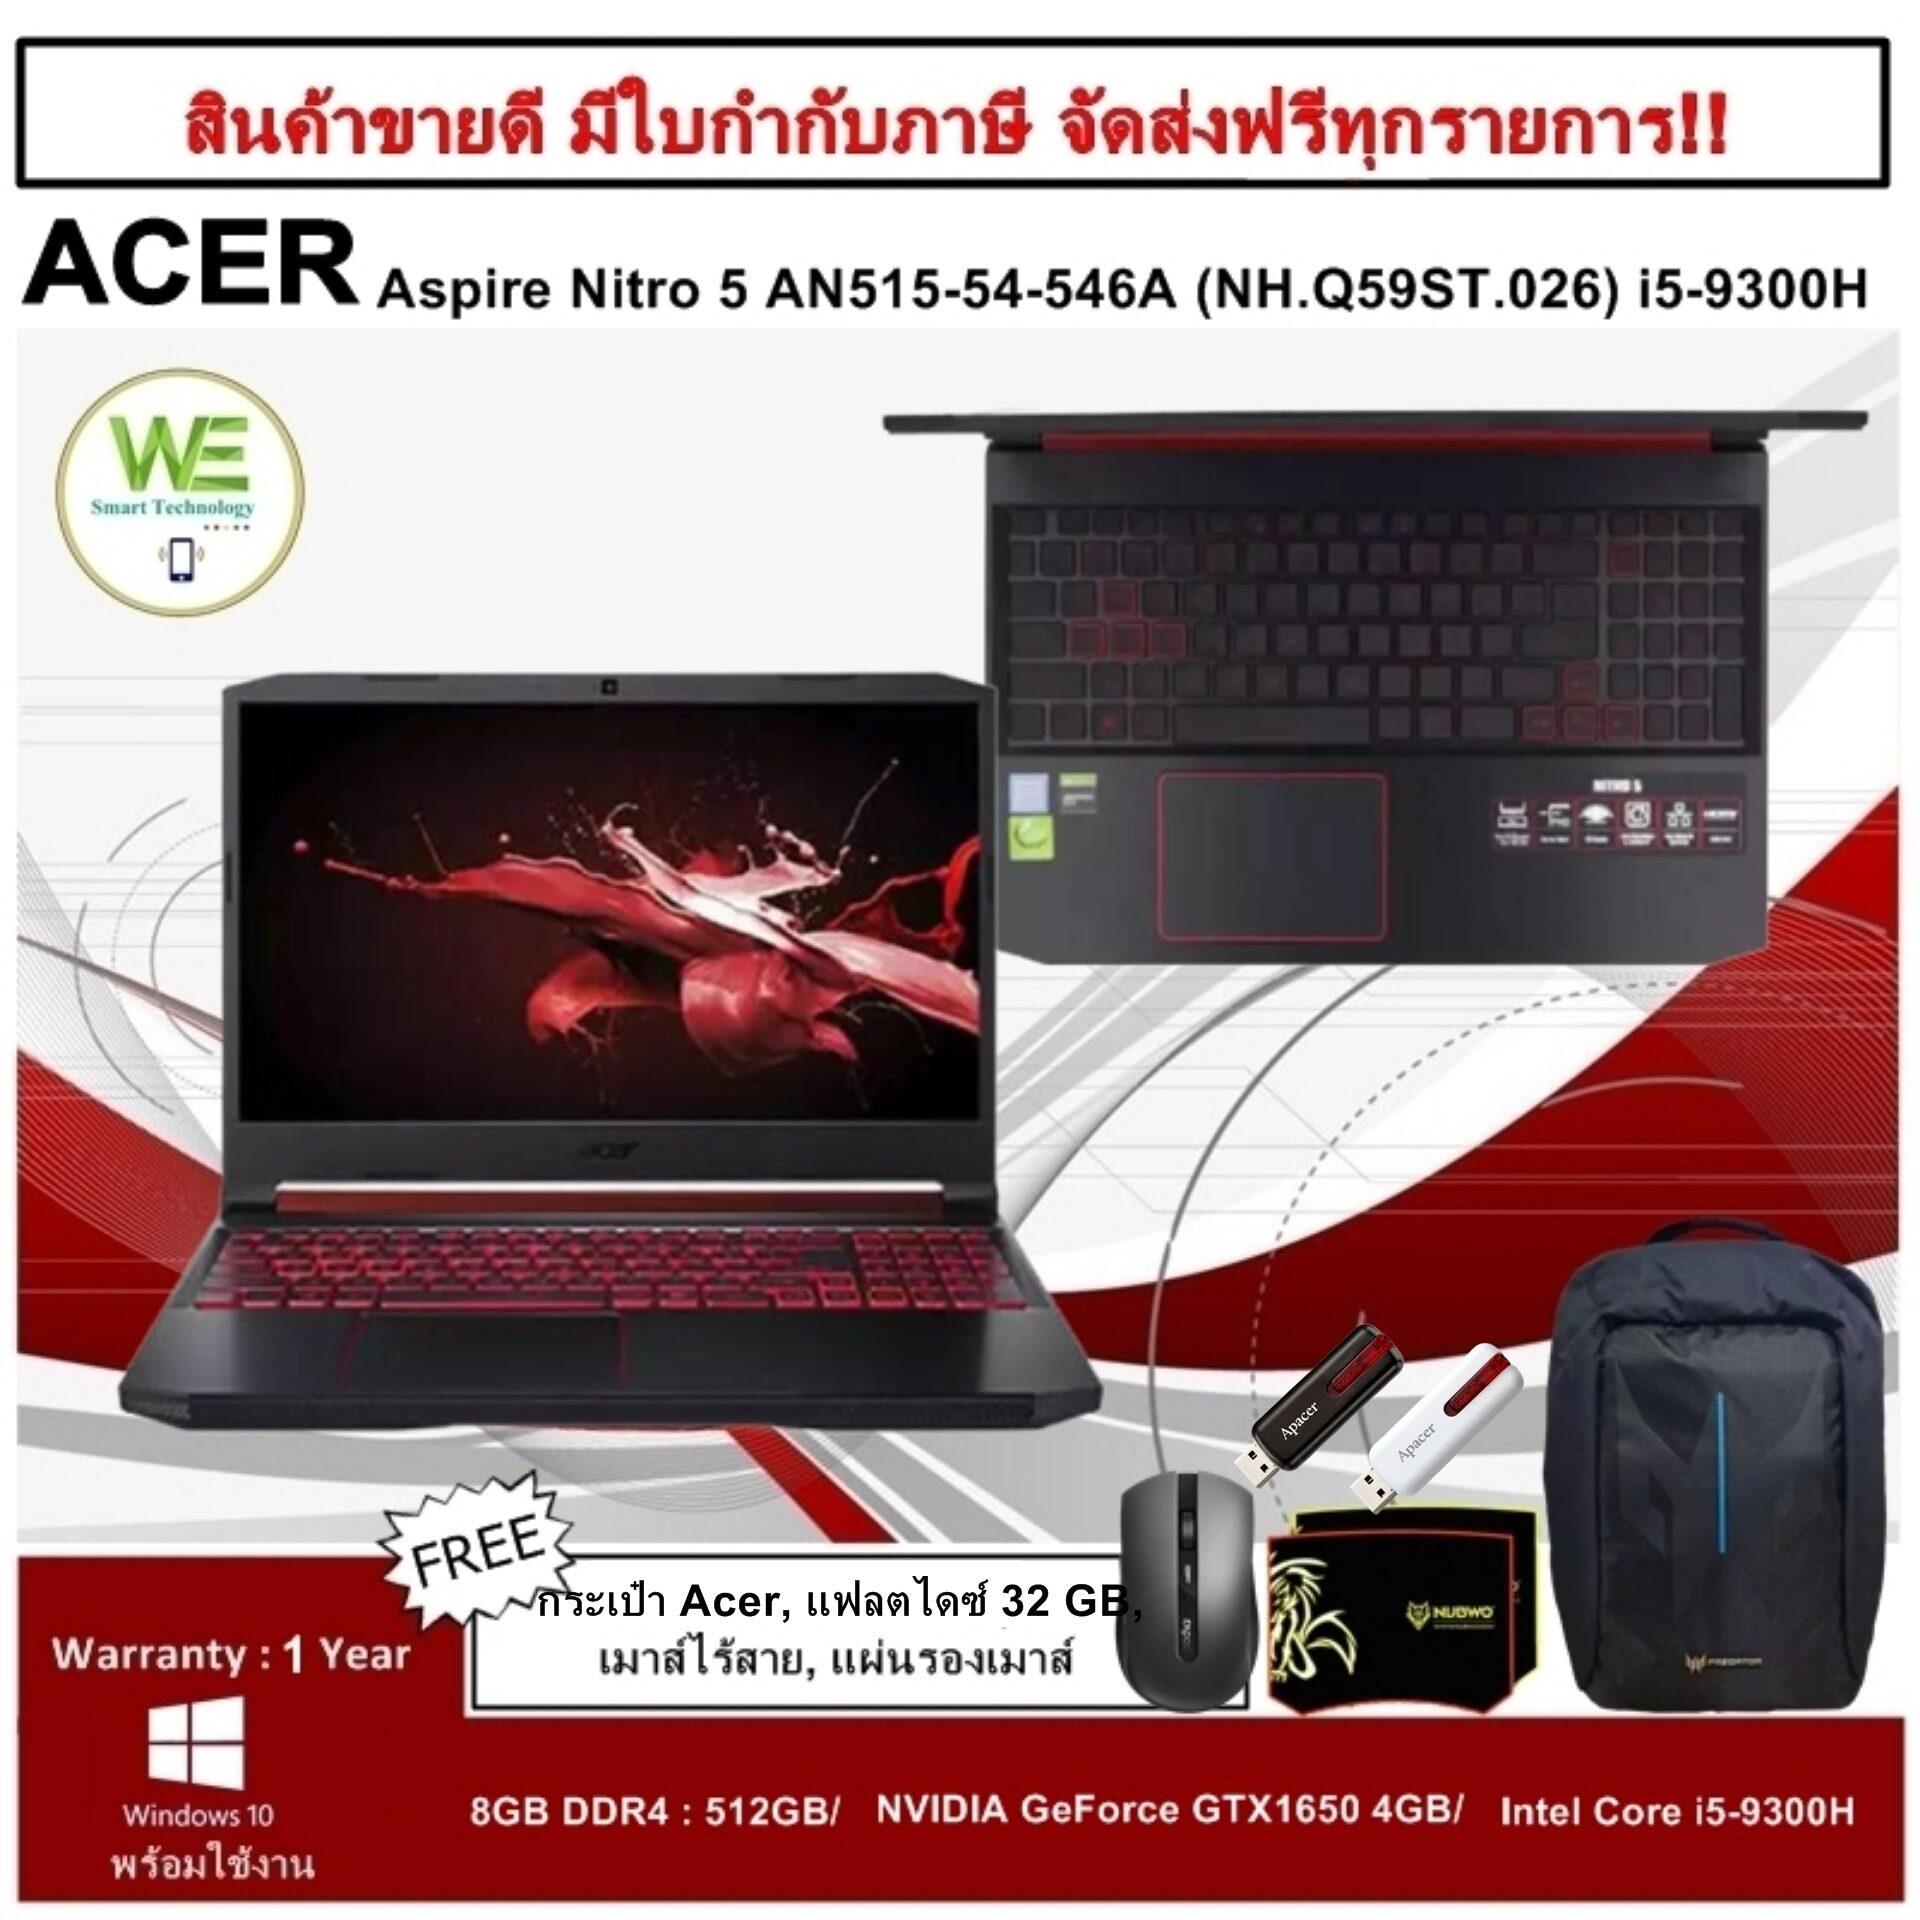 Acer Aspire Nitro 5 An515-54-546a (nh.q59st.026) I5-9300h/8gb/512gb Ssd/geforce Gtx1650 4gb/15.6 Fhd Ips 144hz/win10home/obsidian Black.